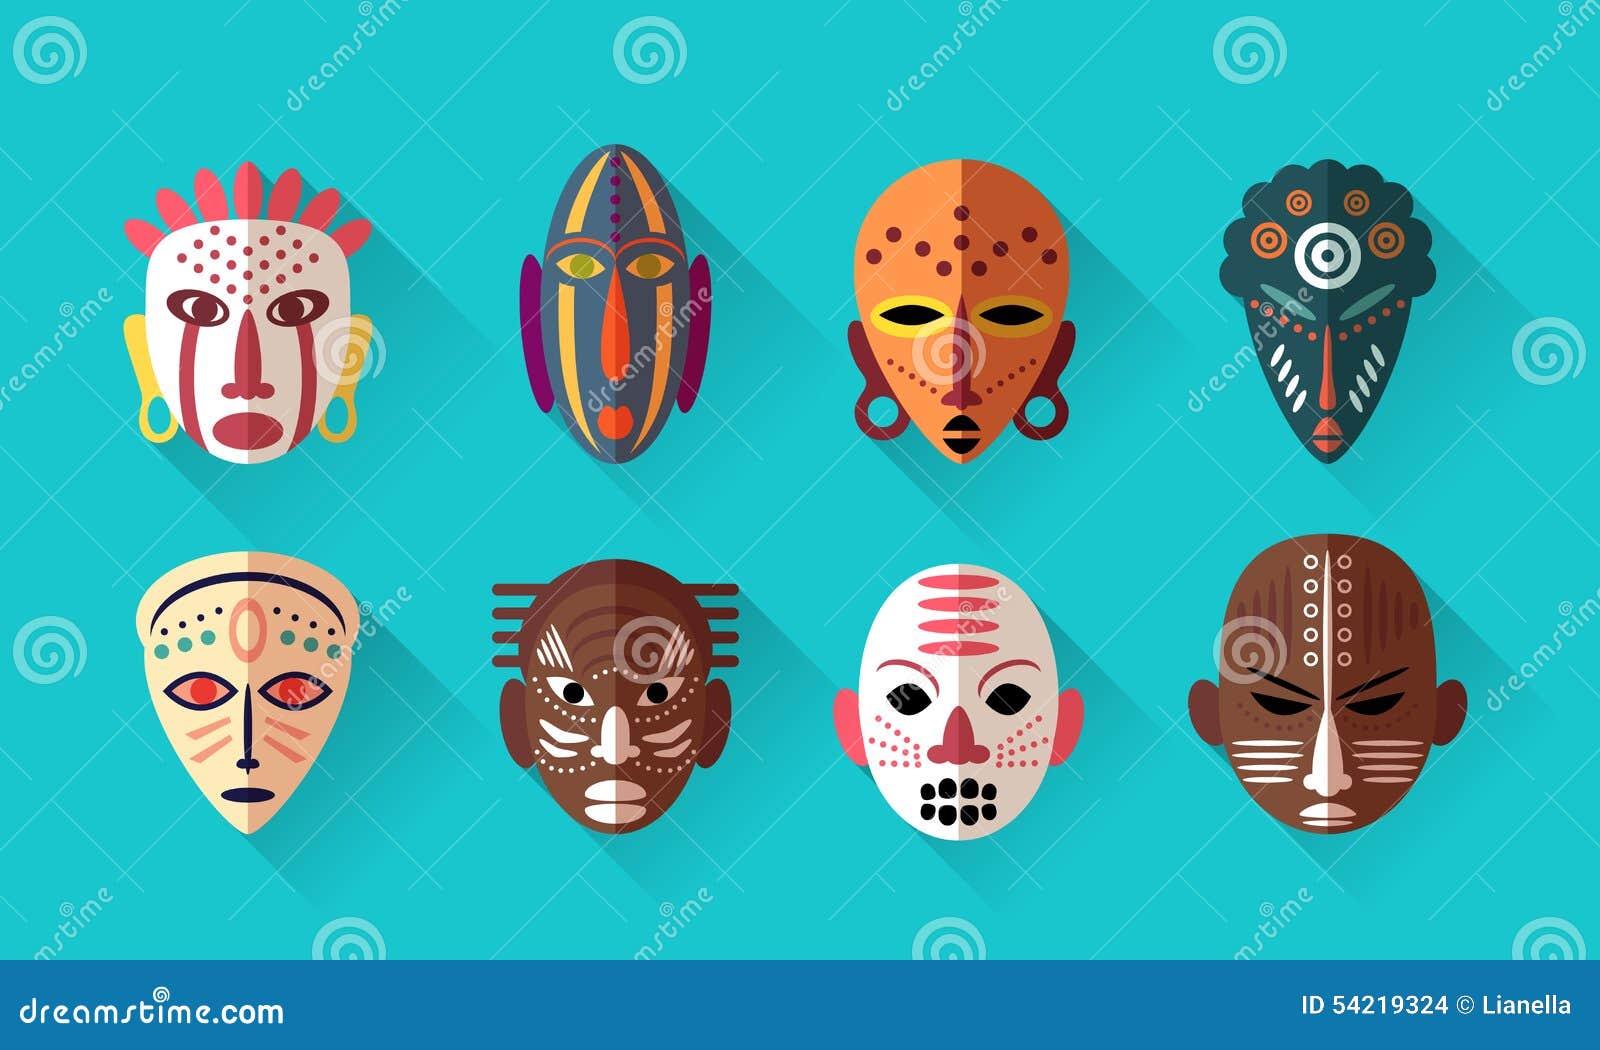 afrikanische masken ikonen vektor abbildung bild 54219324. Black Bedroom Furniture Sets. Home Design Ideas